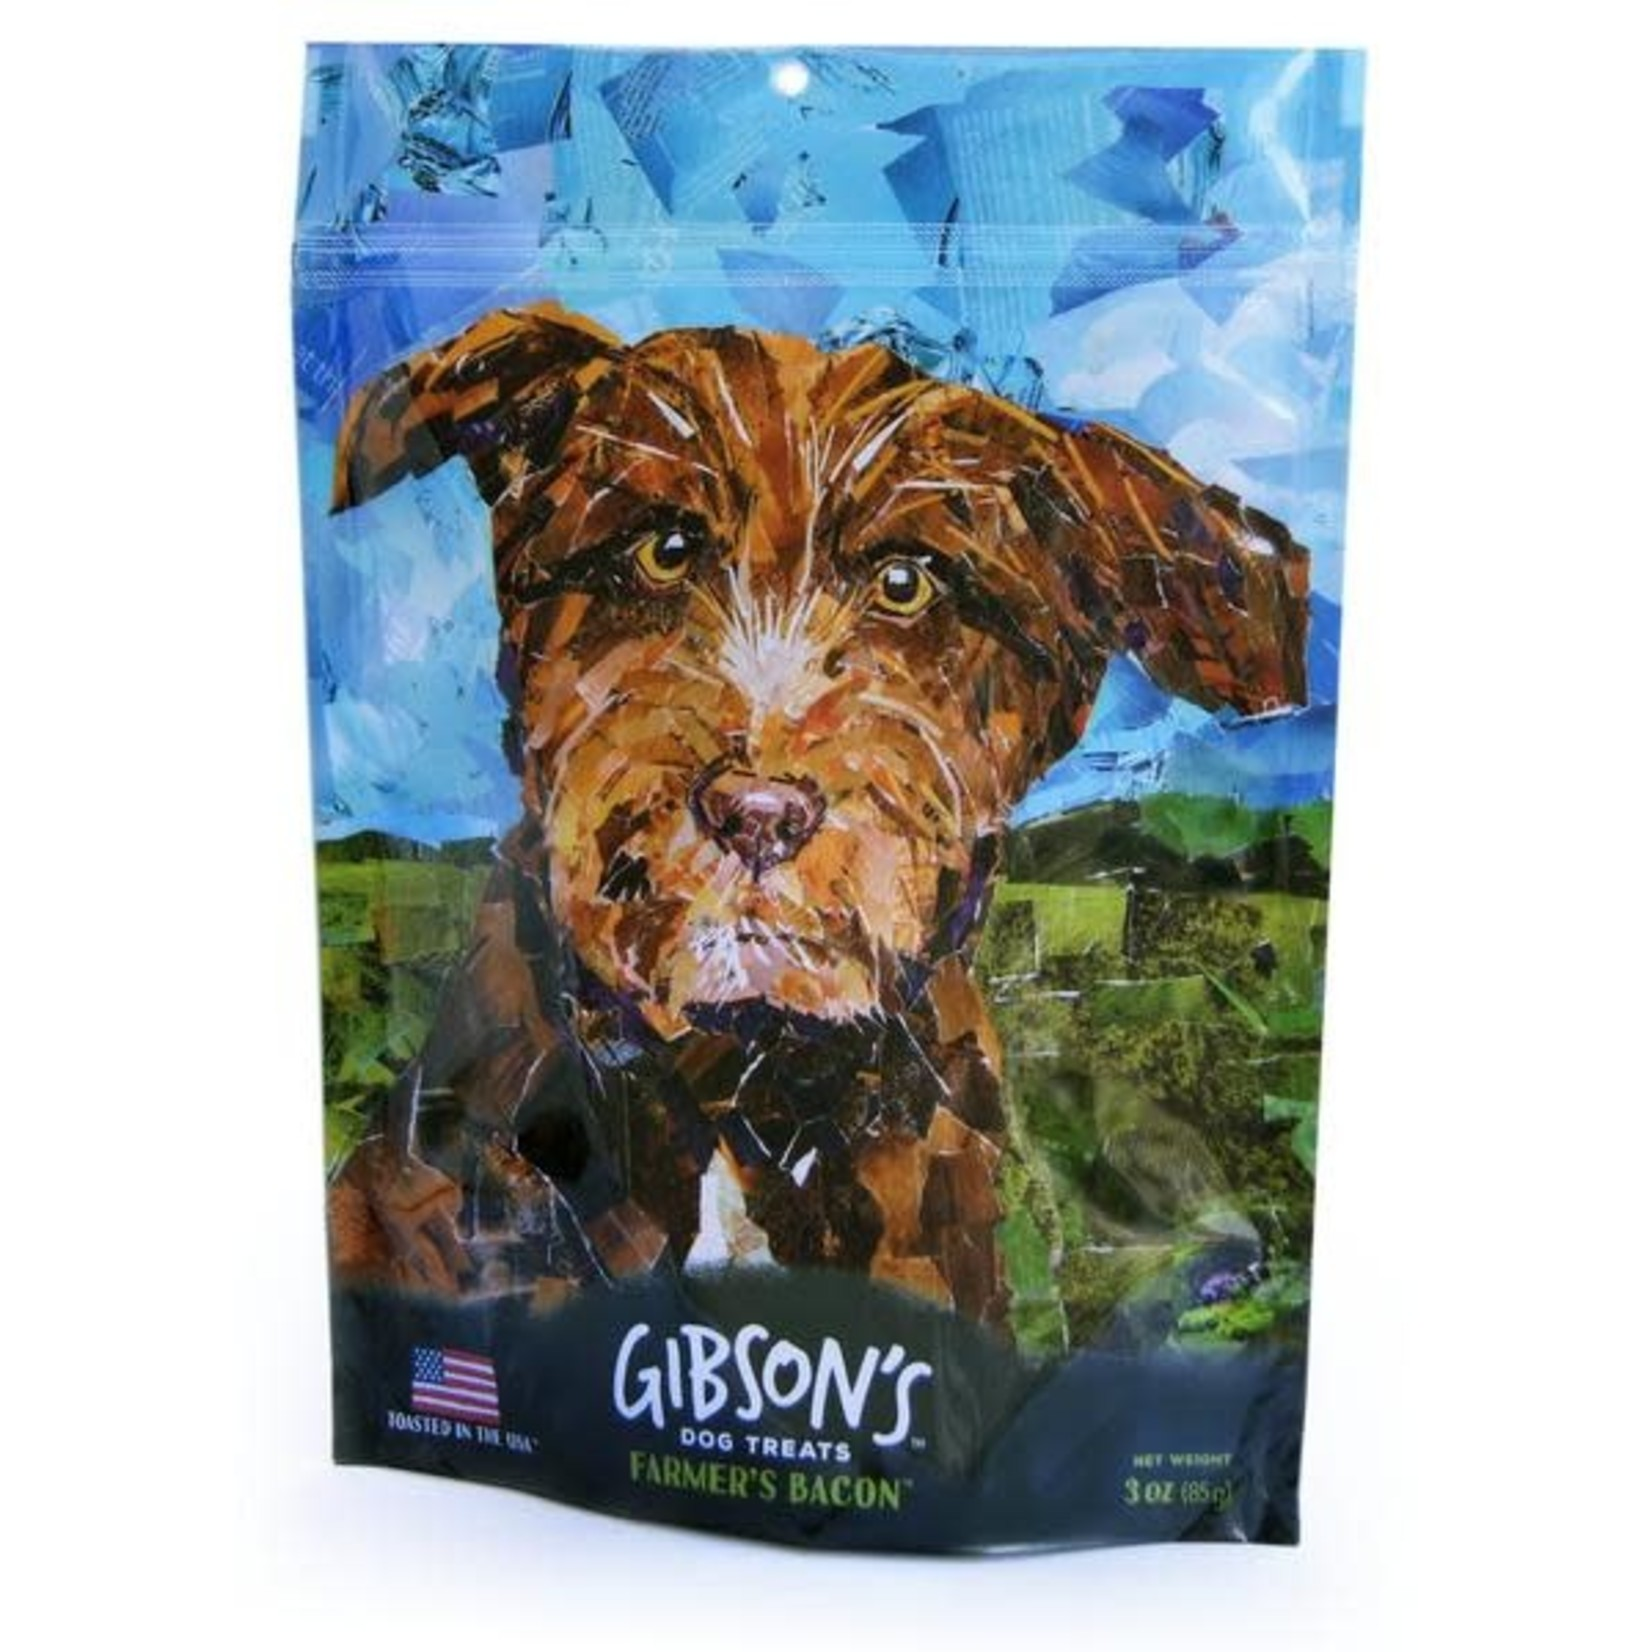 Wild Meadow Farms GIBSON'S Farmer's Bacon Jerky Dog Treats 3oz